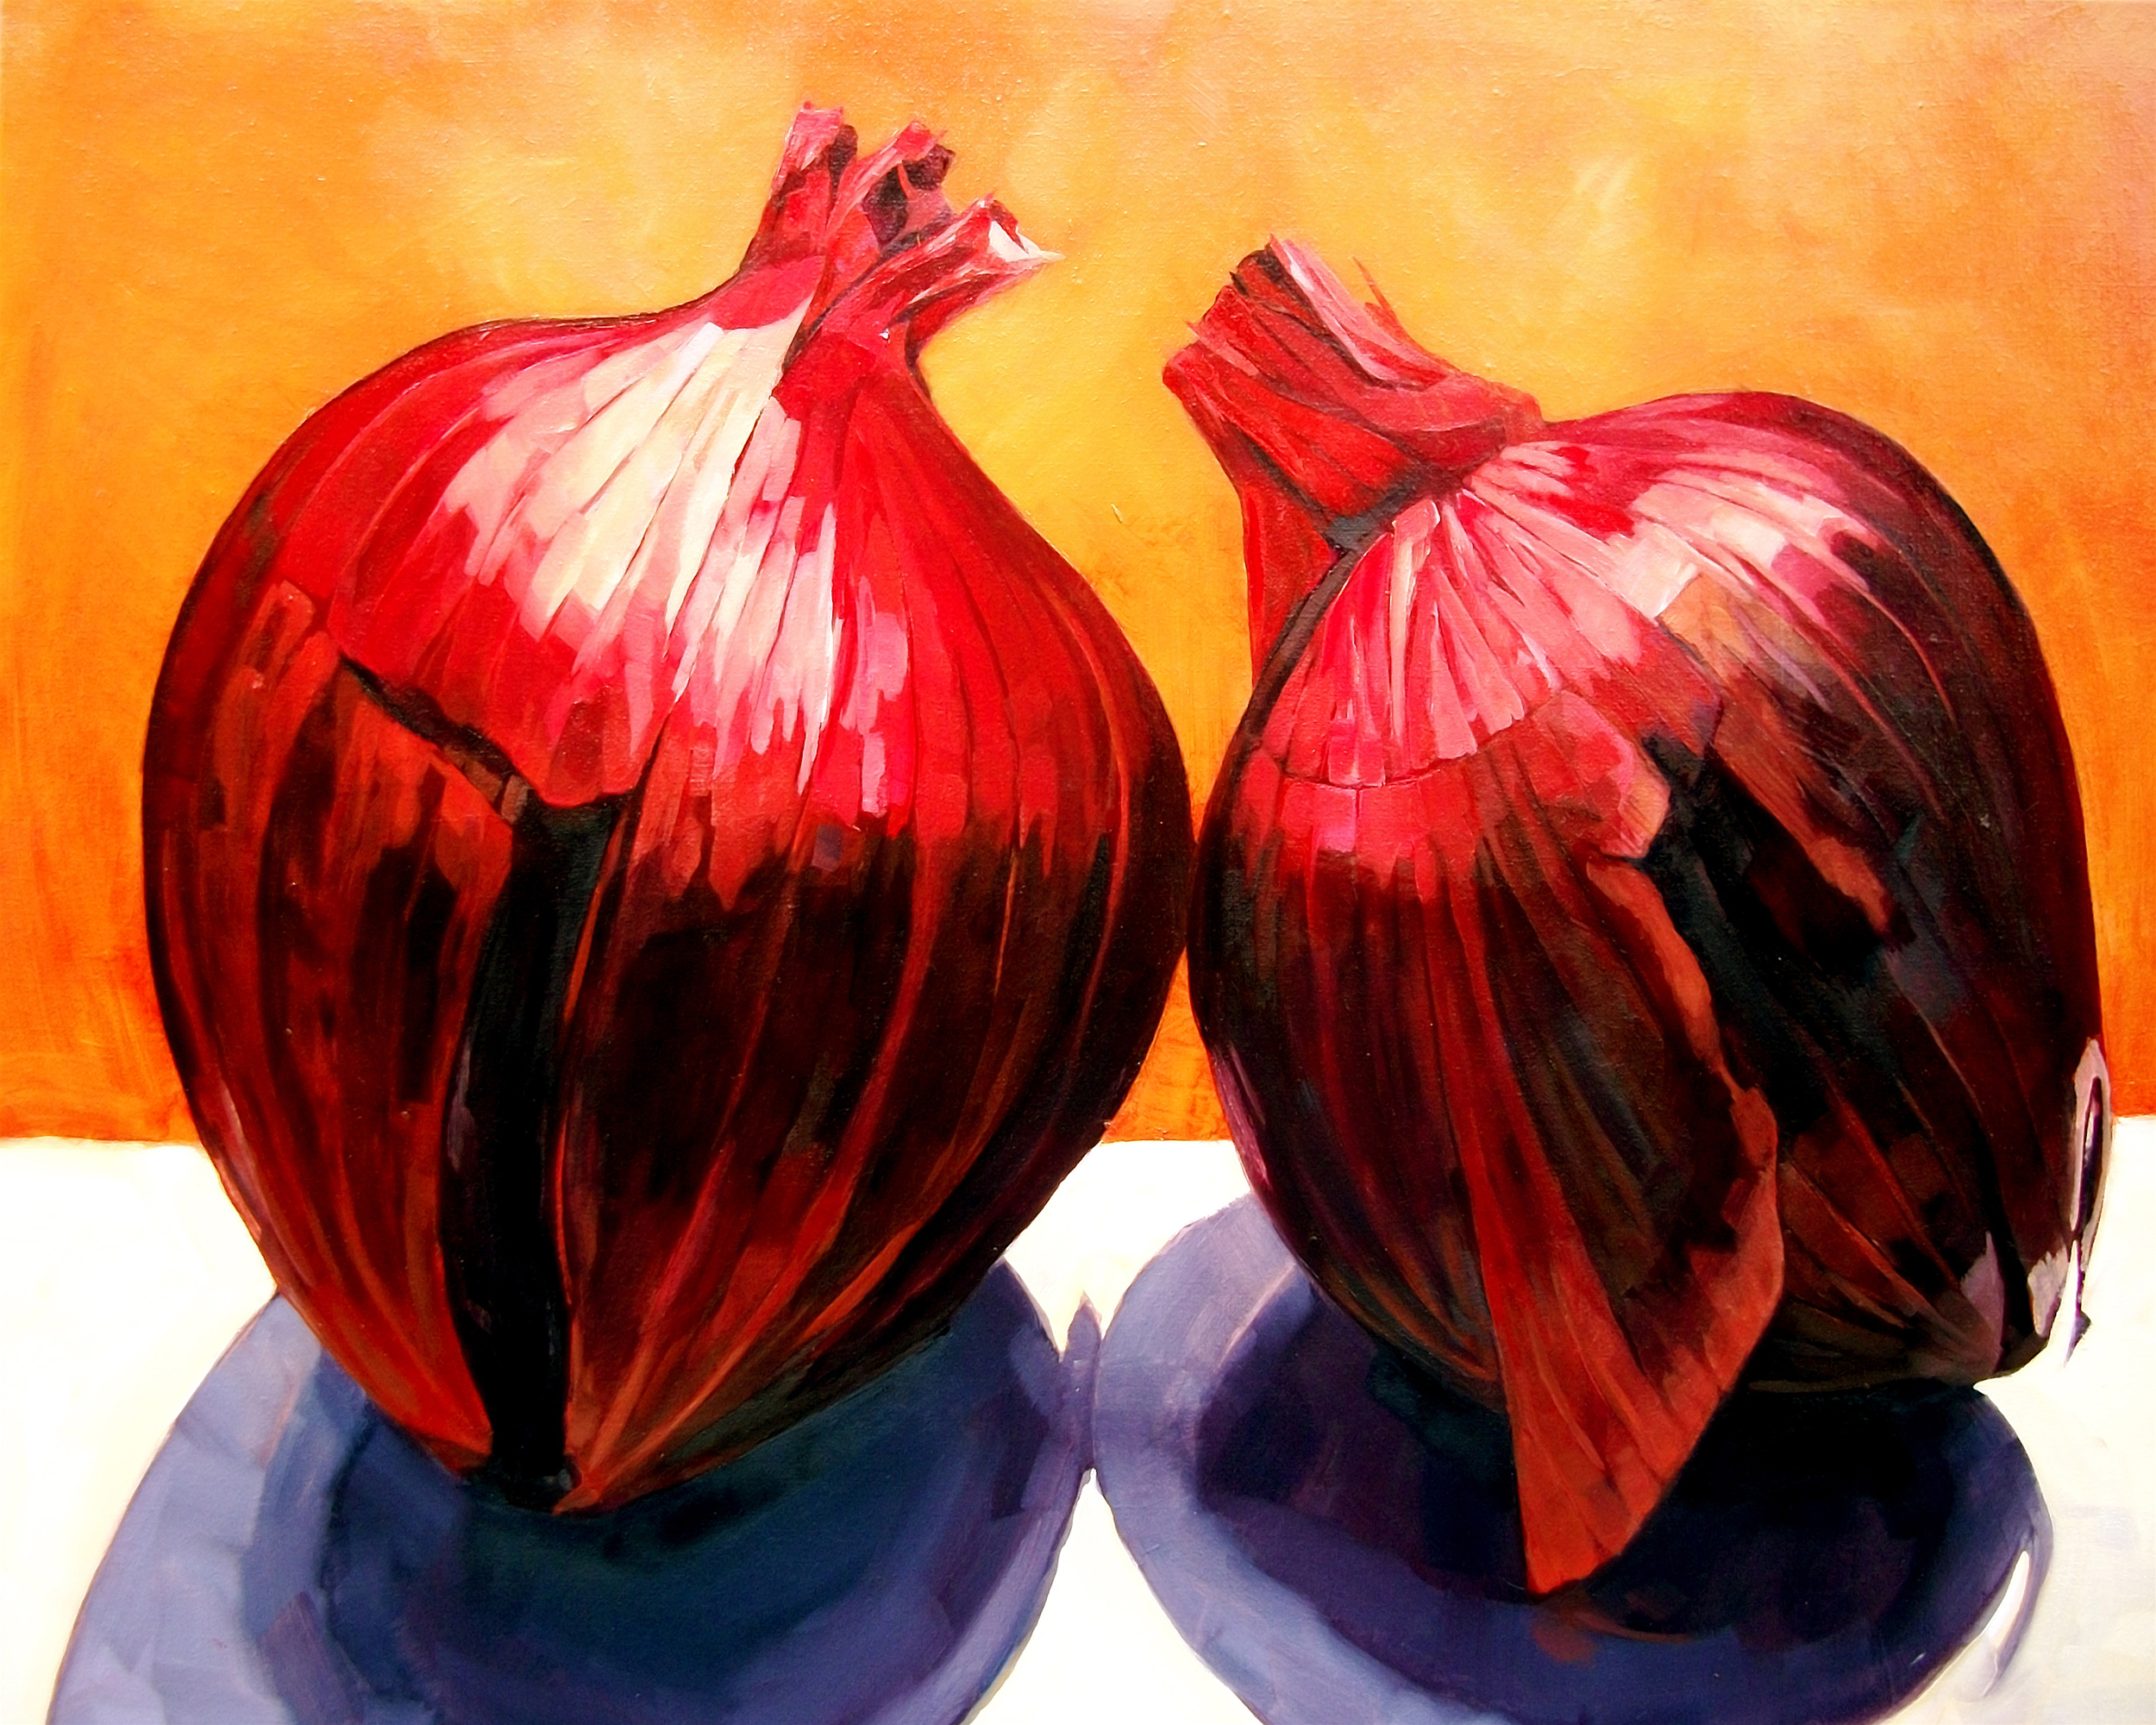 Onion Pair